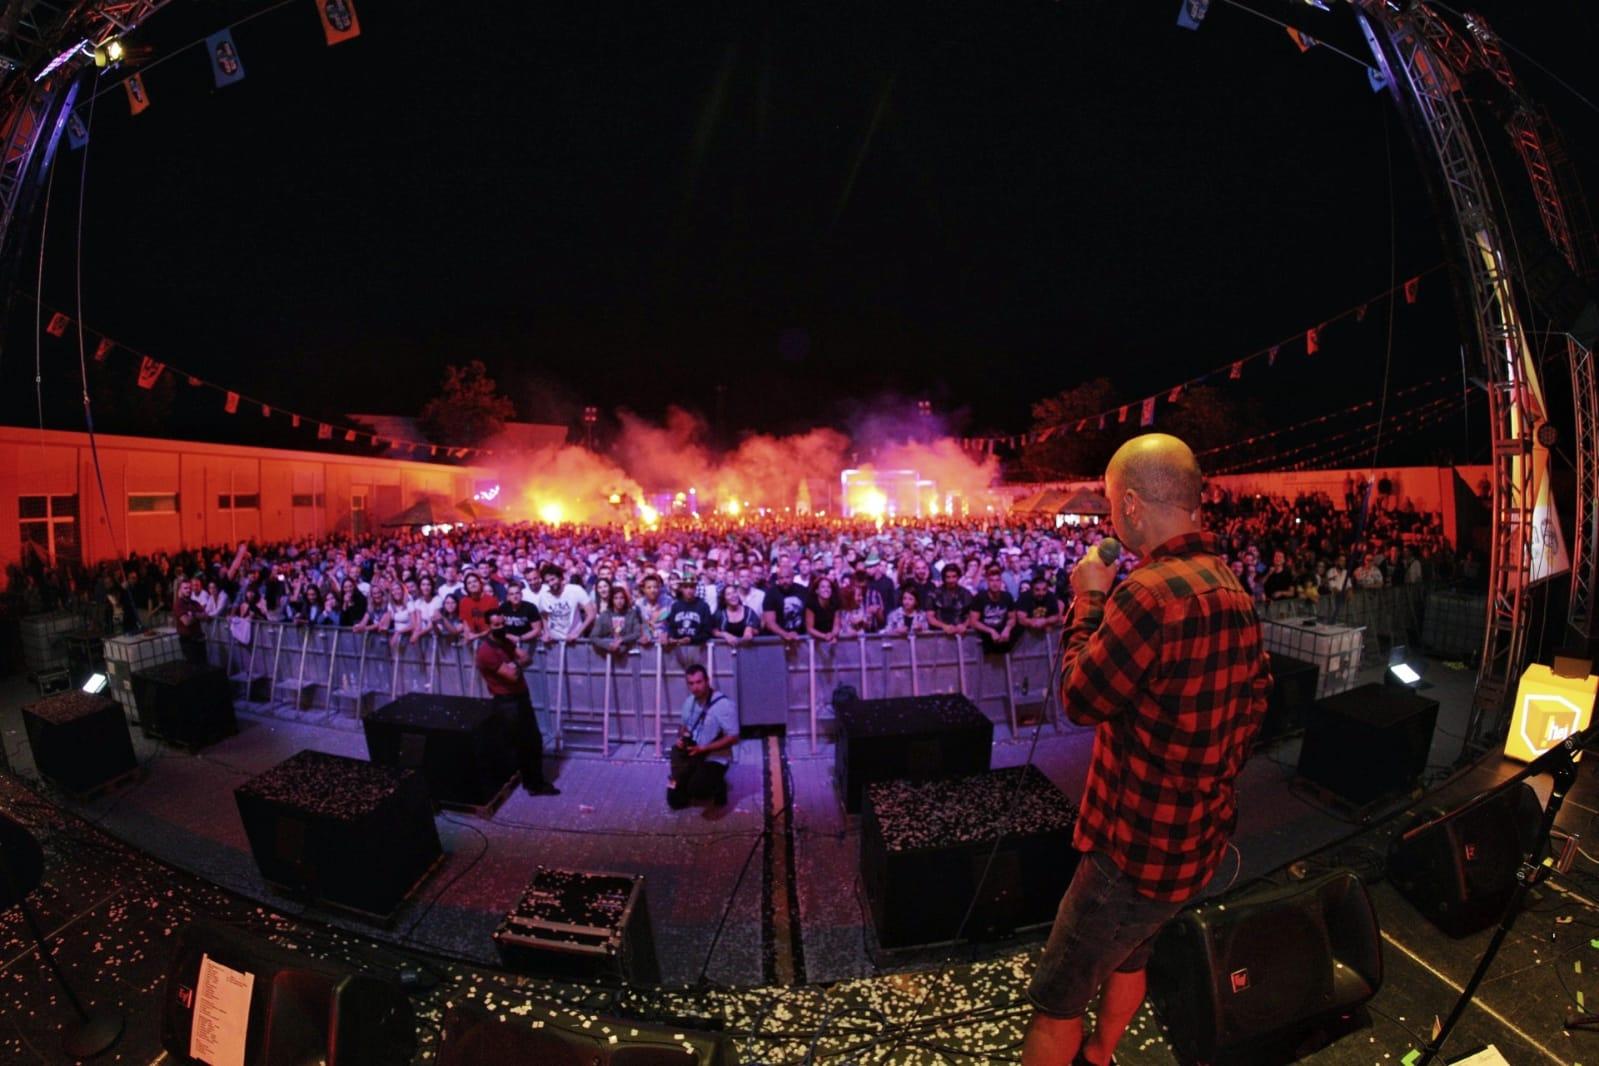 Završen Mostar Summer Fest: za tri noći 10 000 festivaldžija slavilo život